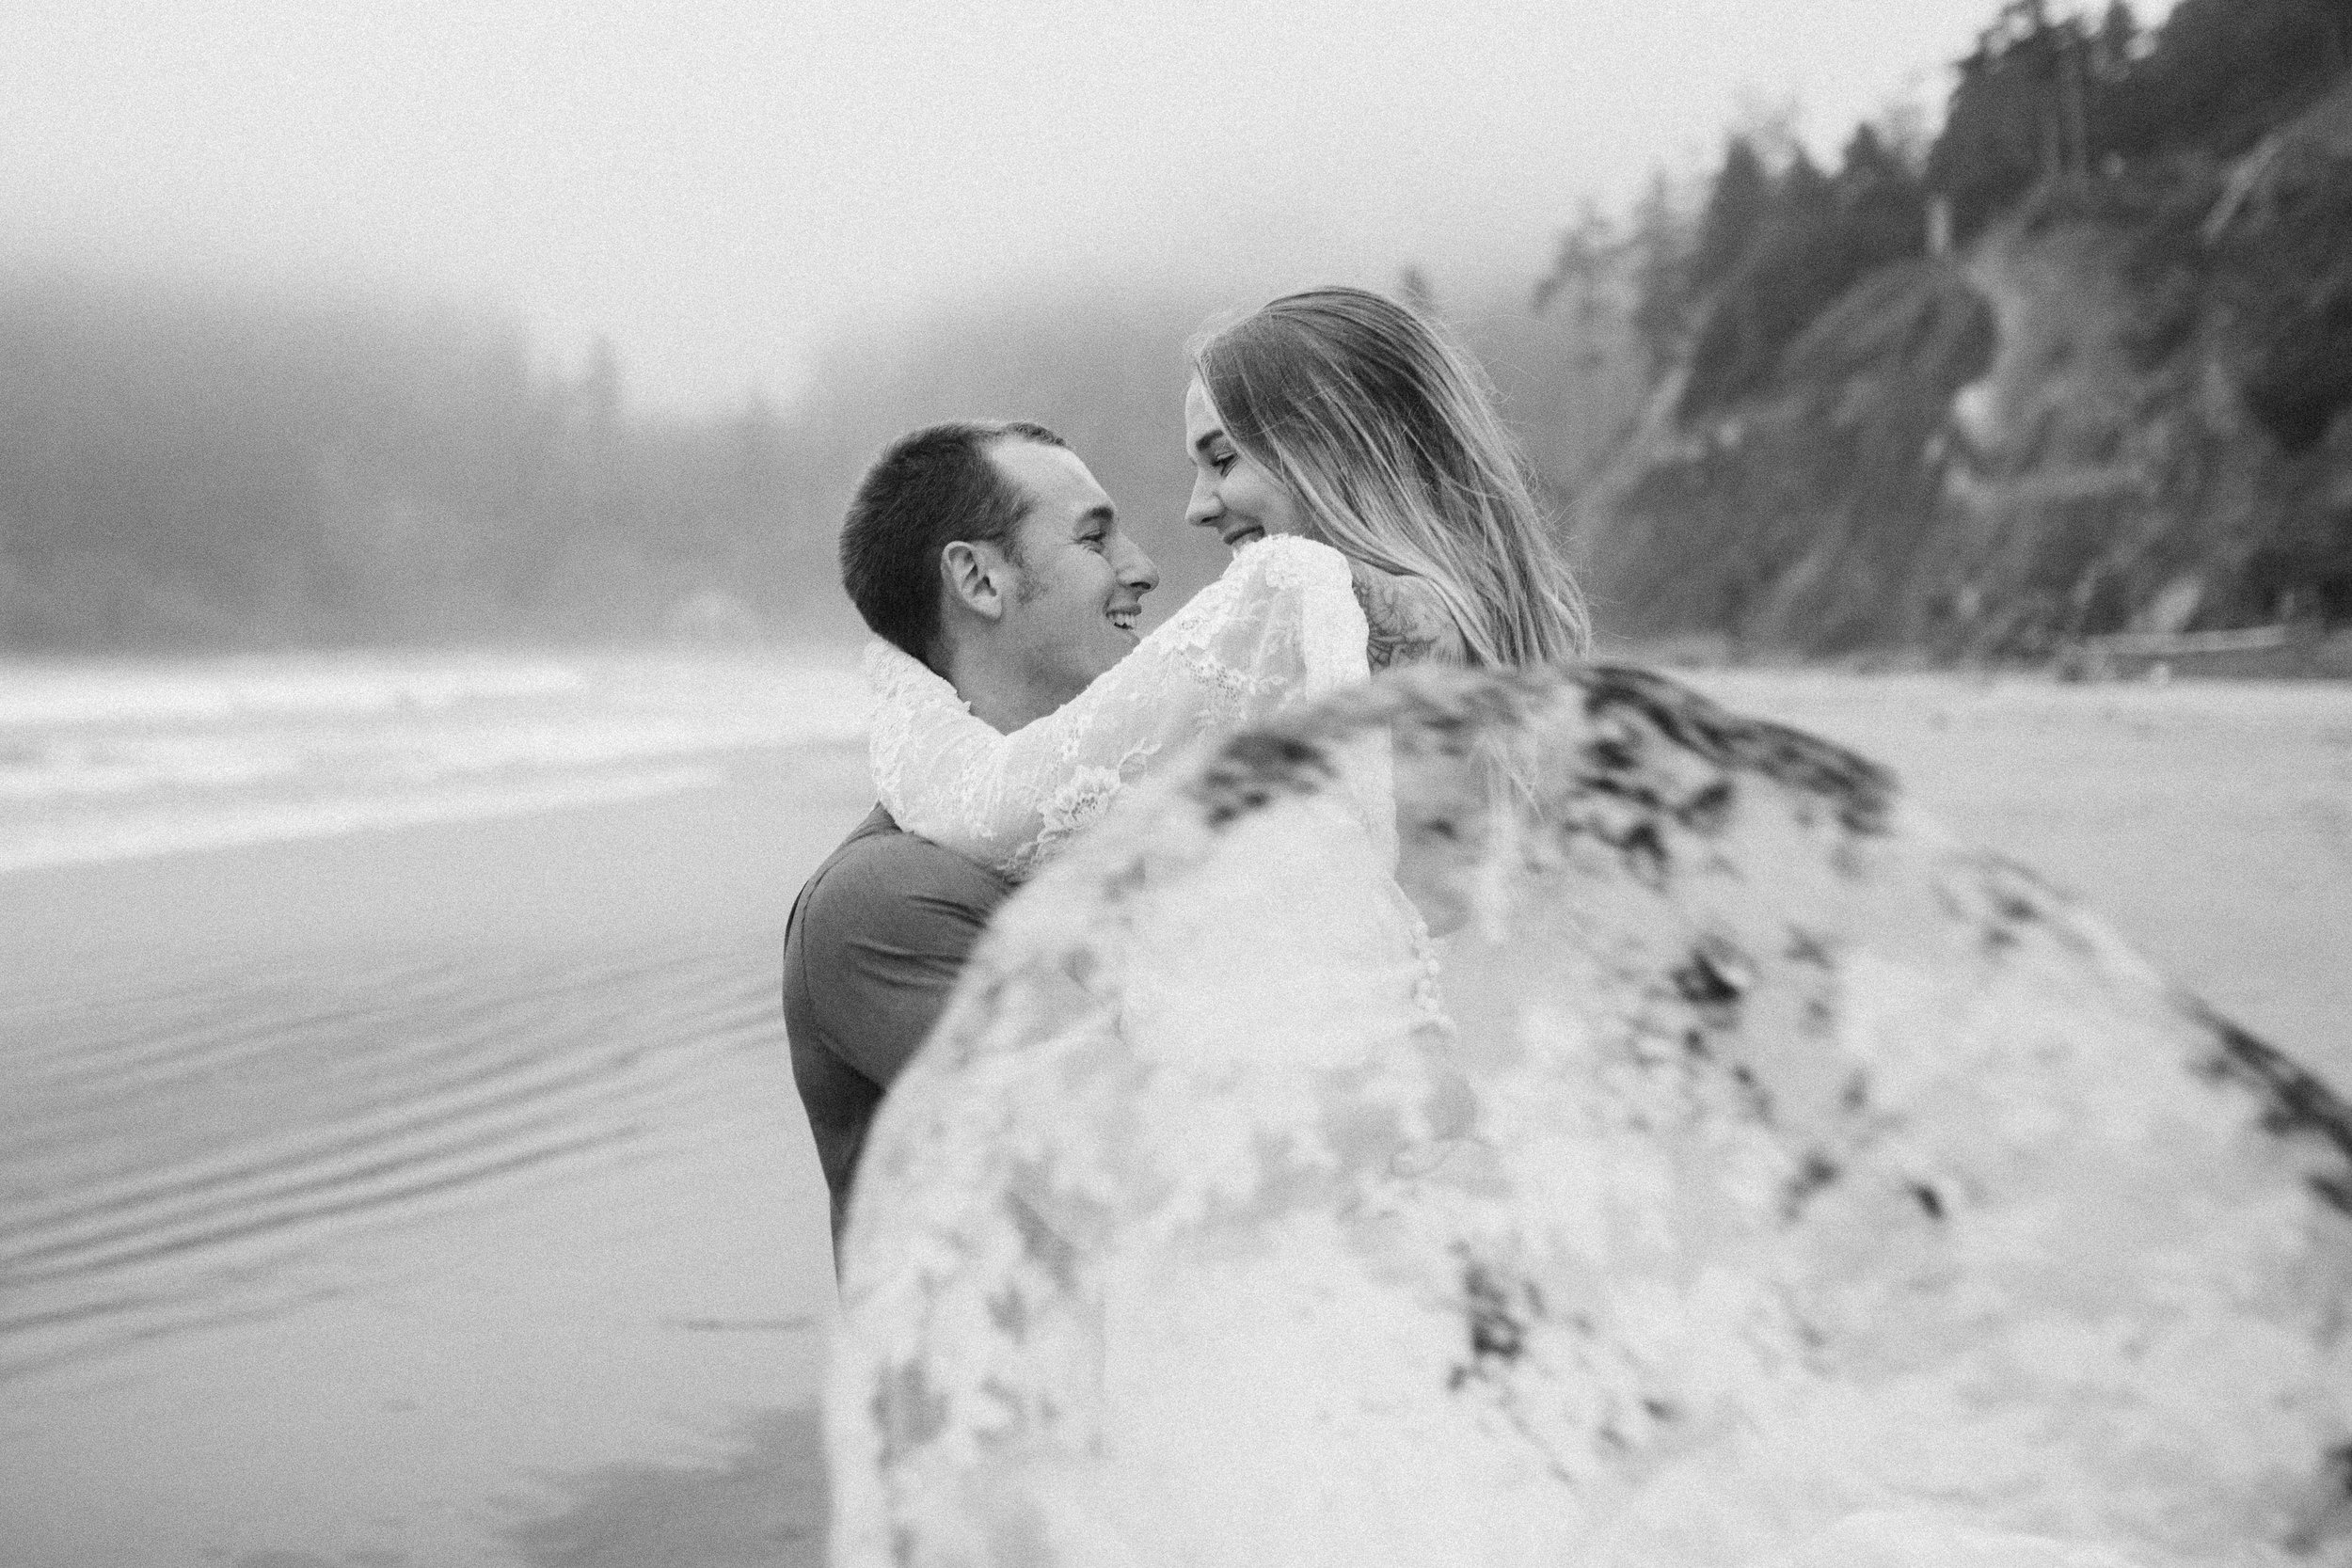 nicole-daacke-photography-ecola-state-park-oregon-elopement-bridal-photos-photographer-for-cannon-beach-elopement-oregon-coast-elopement-photographer-foggy-summer-elopement-cannon-beach-best-adventure-elopement-photographer-7066.jpg